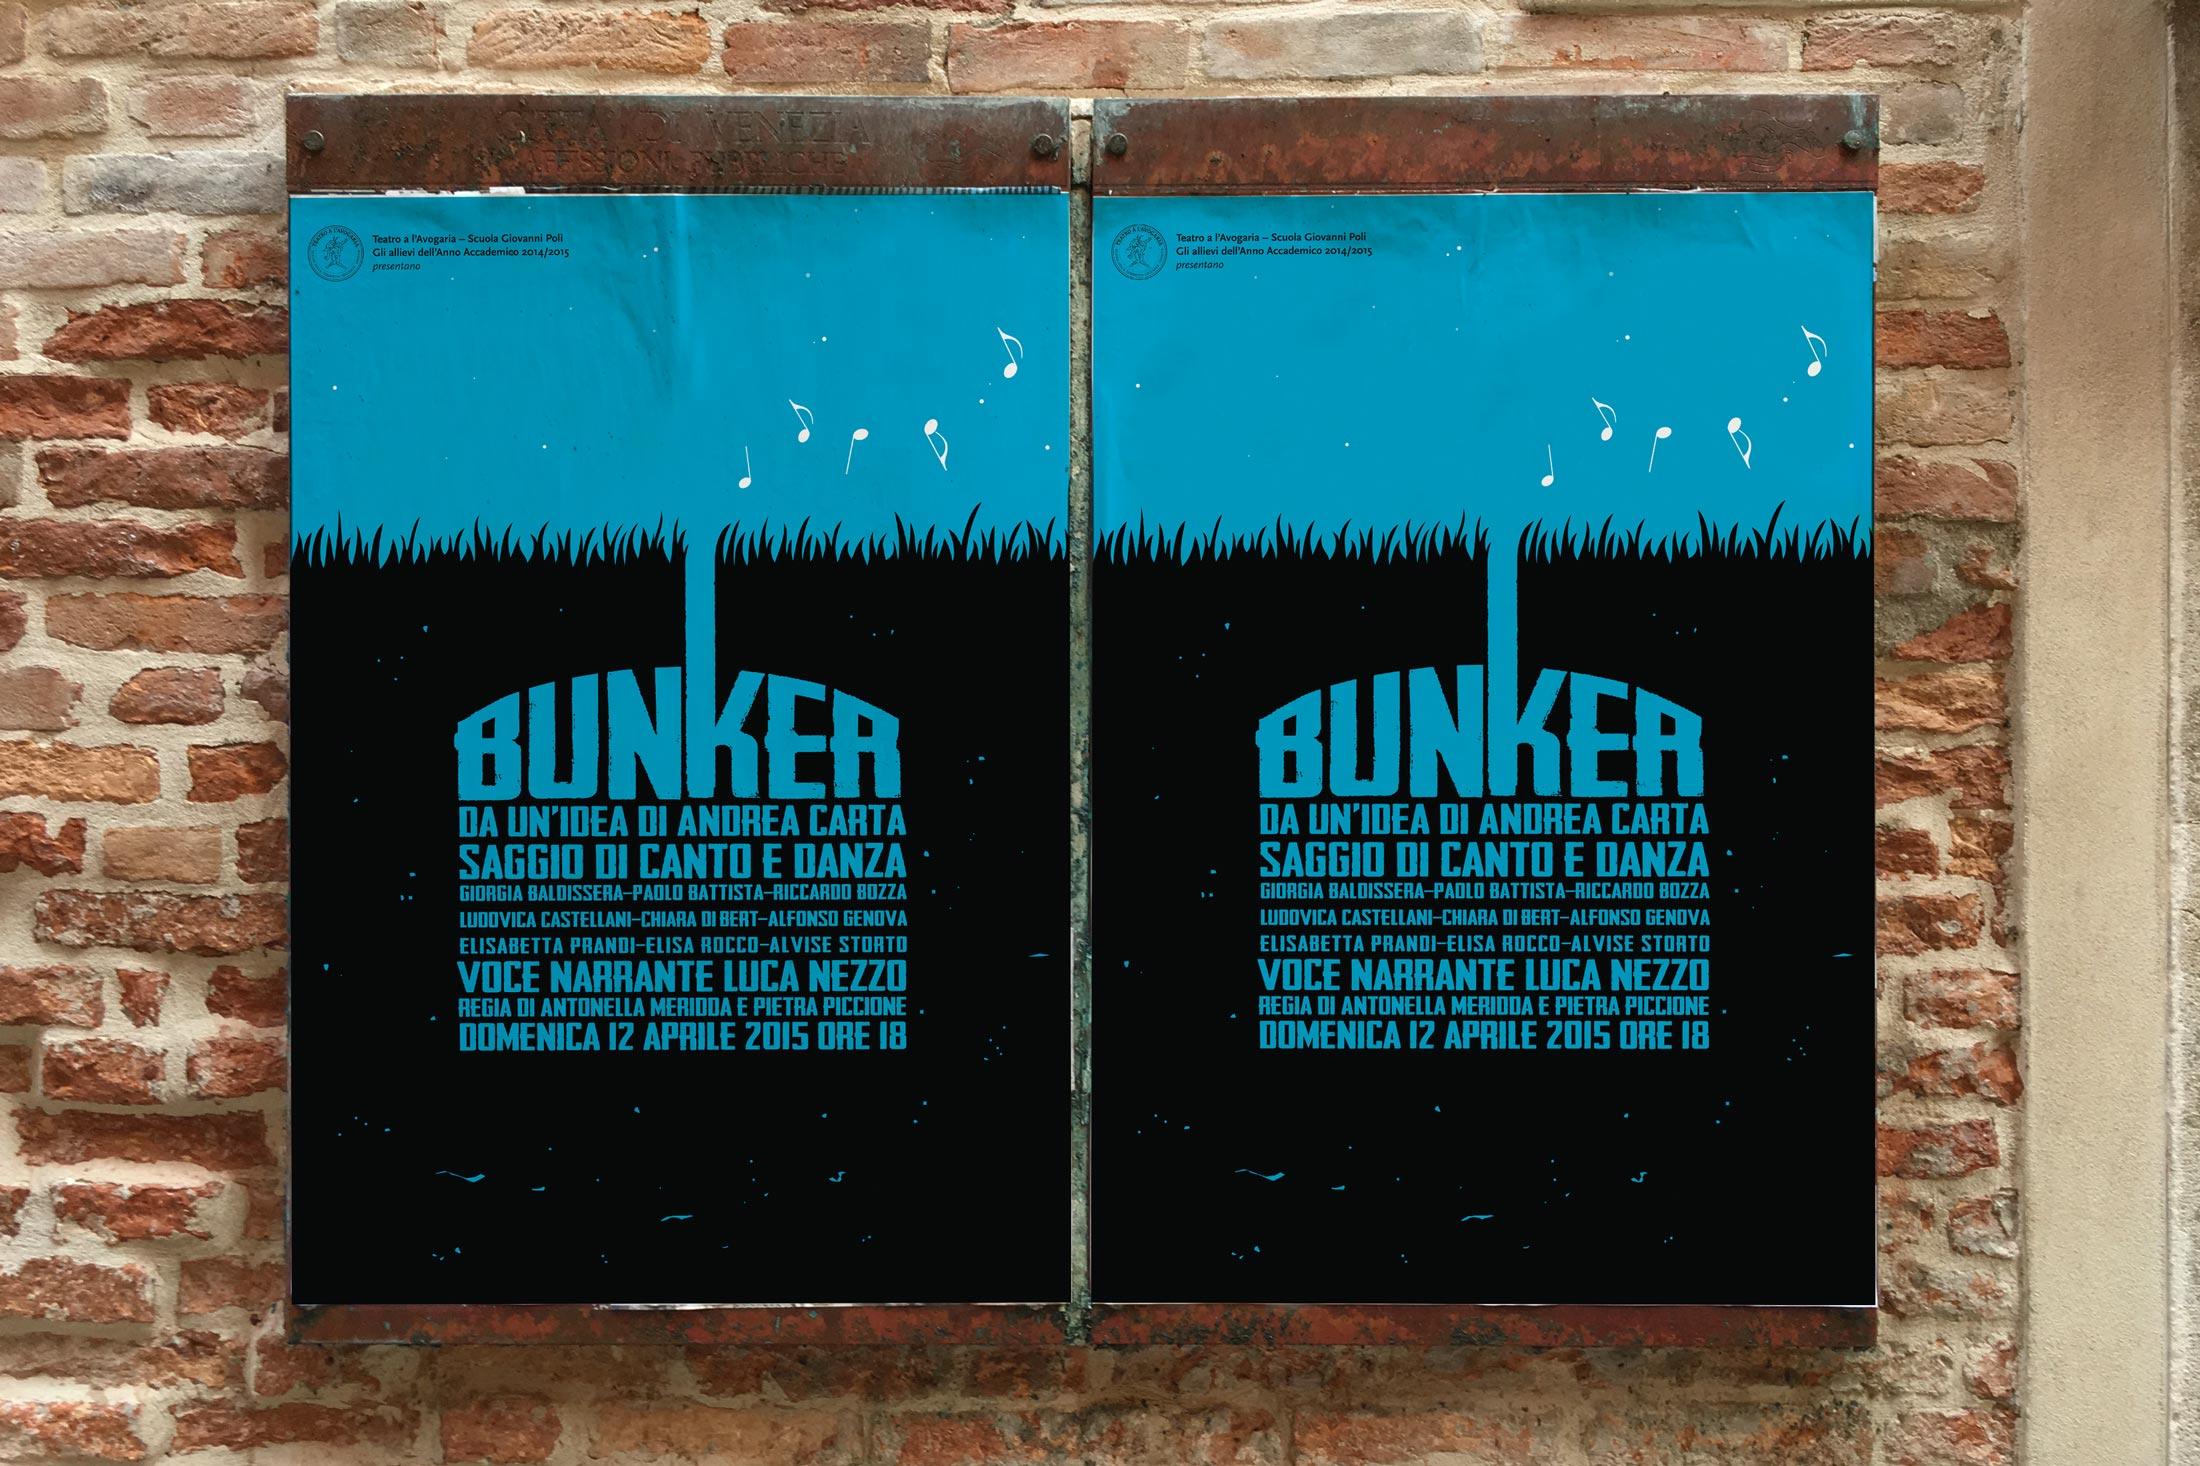 Bunker - locandine